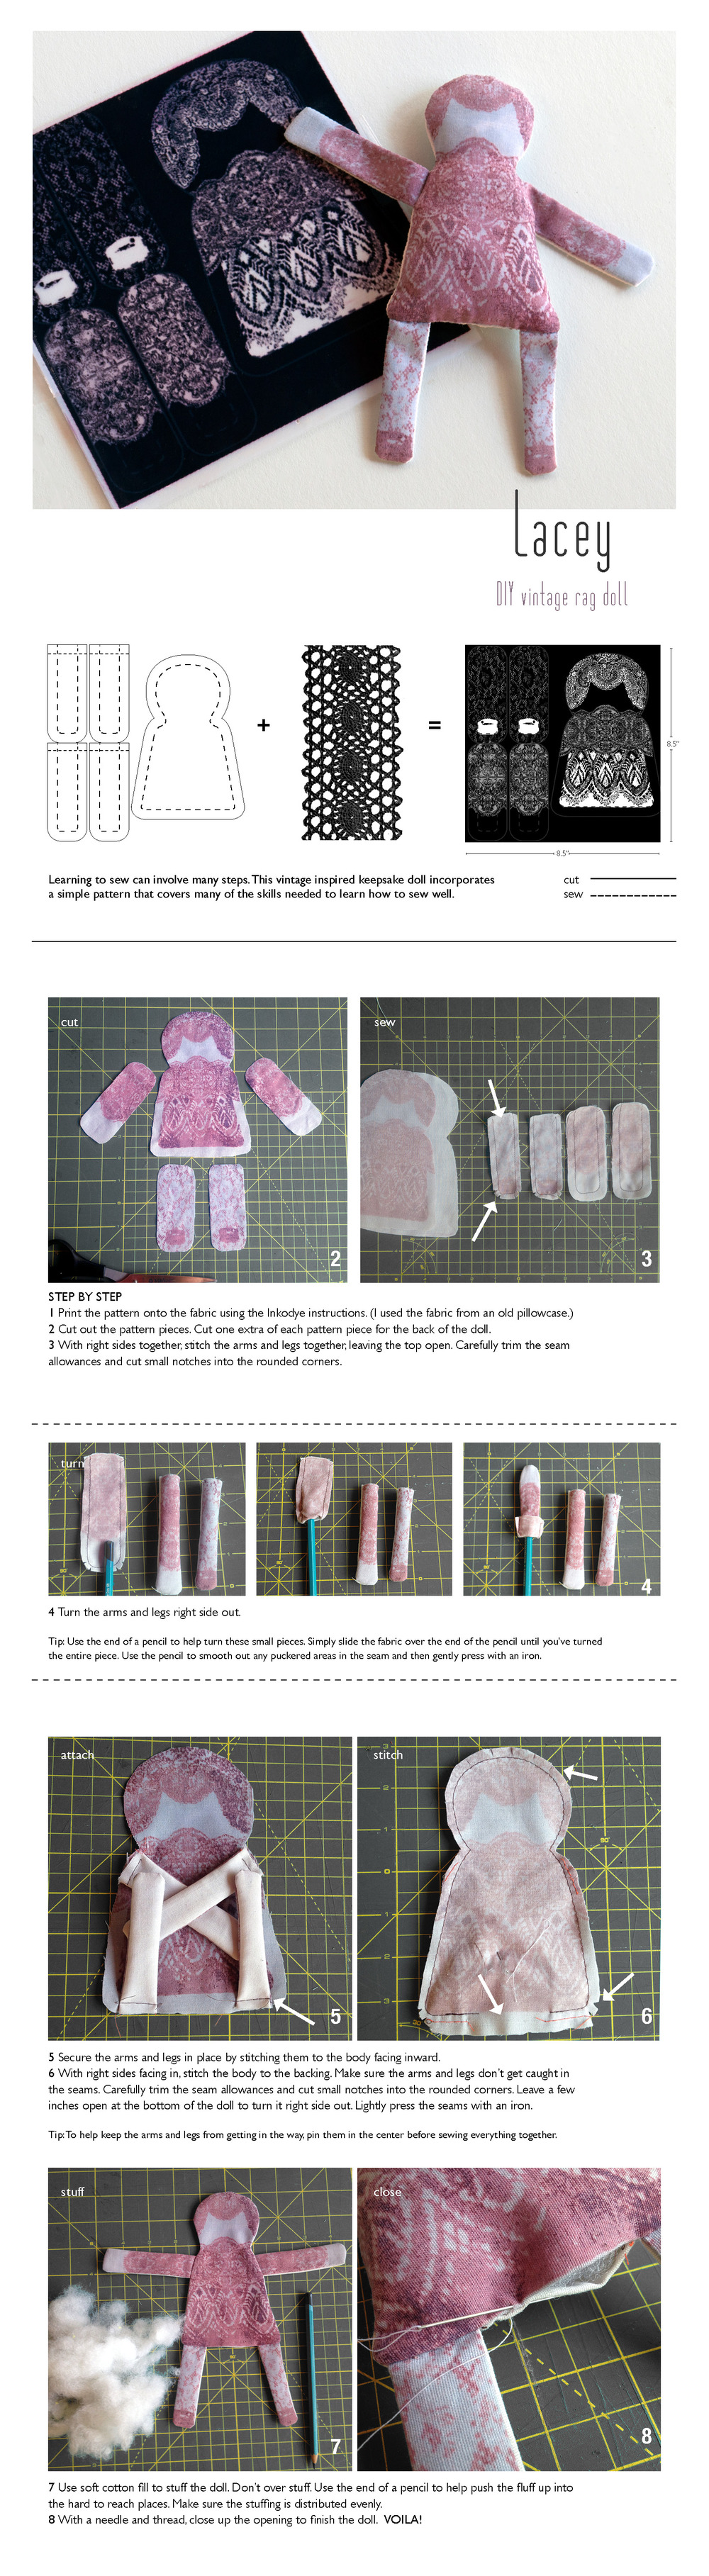 Lumi_lacey doll.jpg